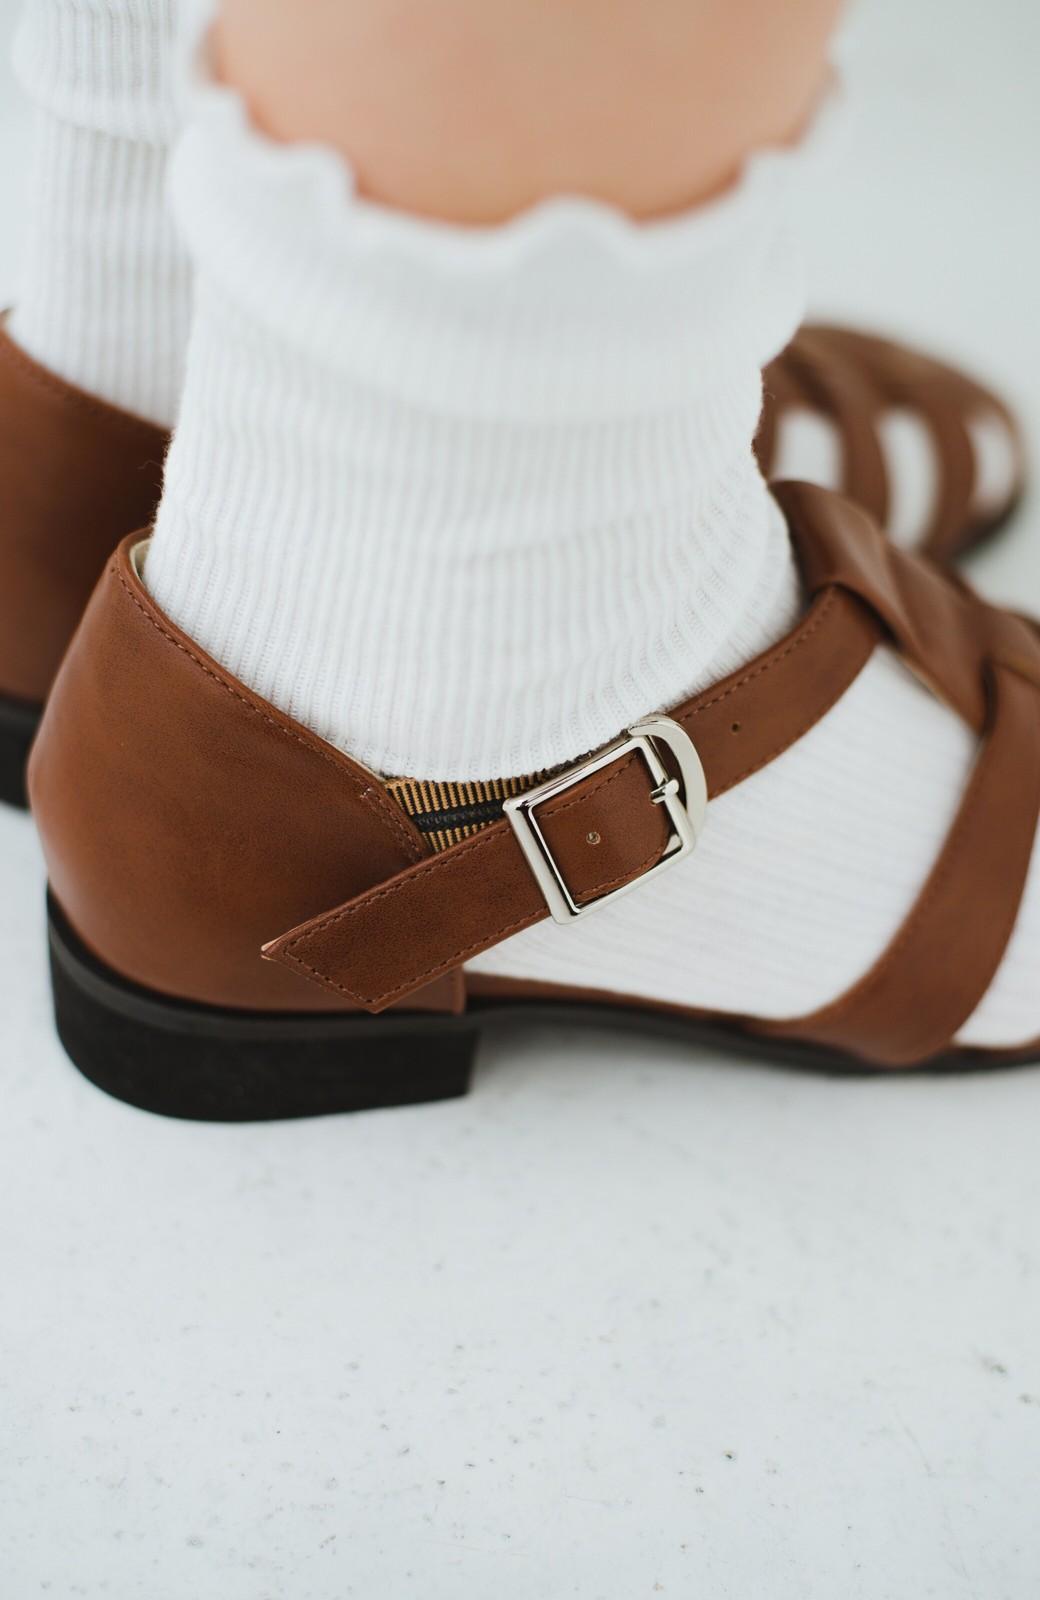 haco! 靴下でも素足でも合う 本革風編み込みサンダル <ブラウン>の商品写真10